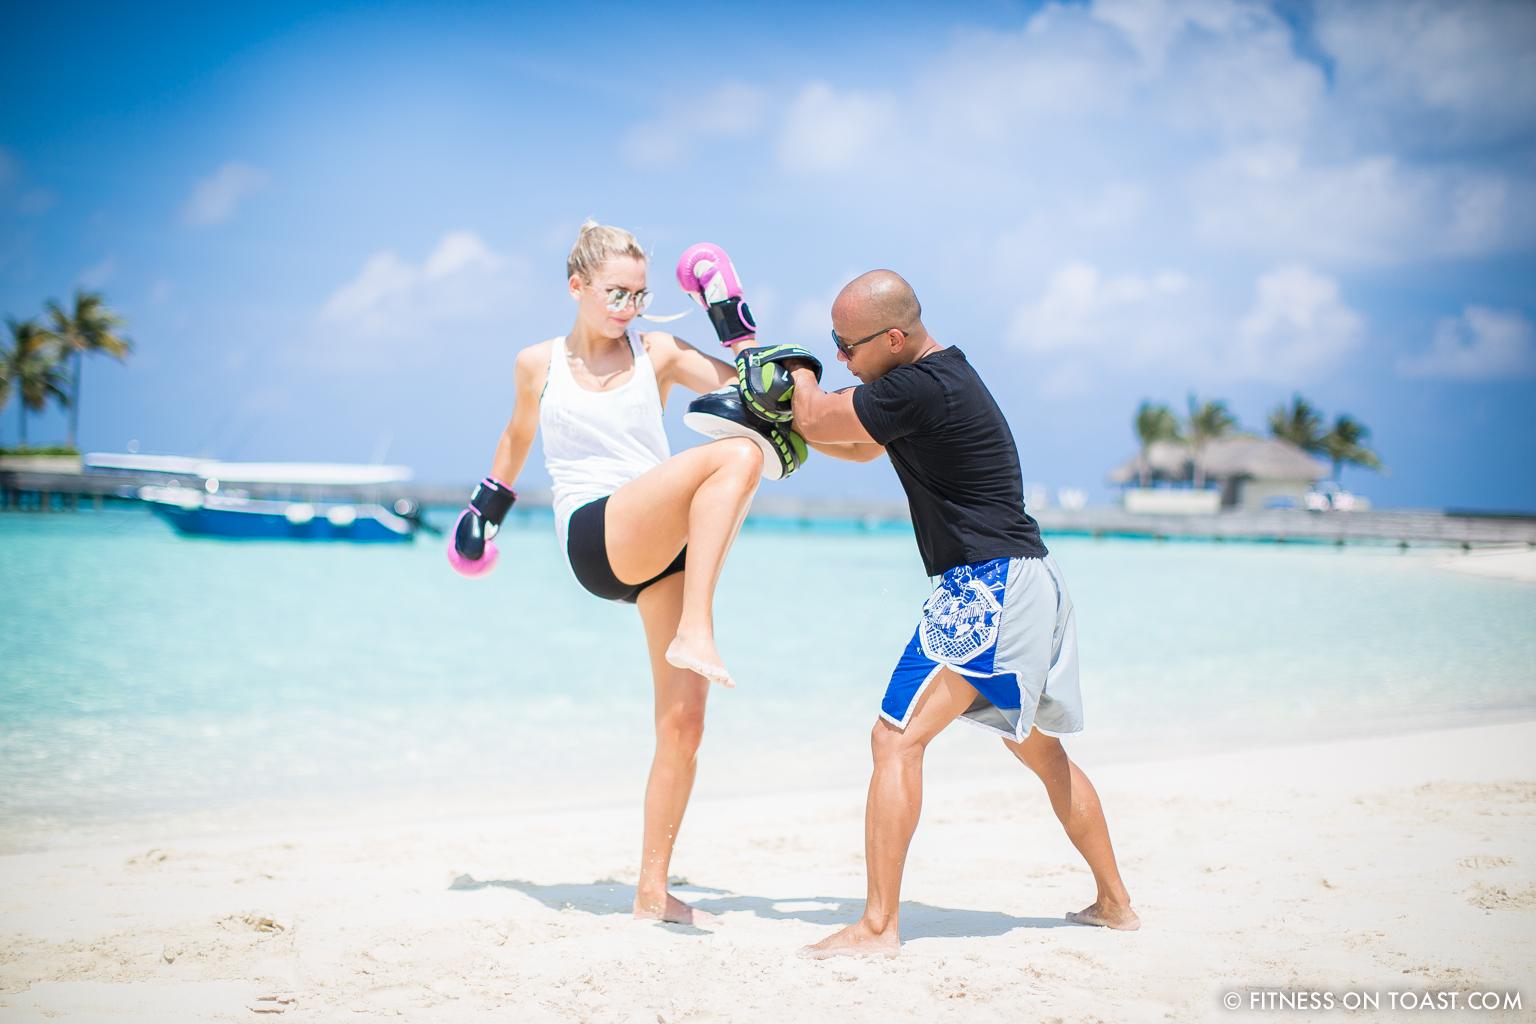 Fitness On Toast Faya Blog Healthy Workout Exercise Apple Watch Maldives Reethi Rah W Resort Spa-42